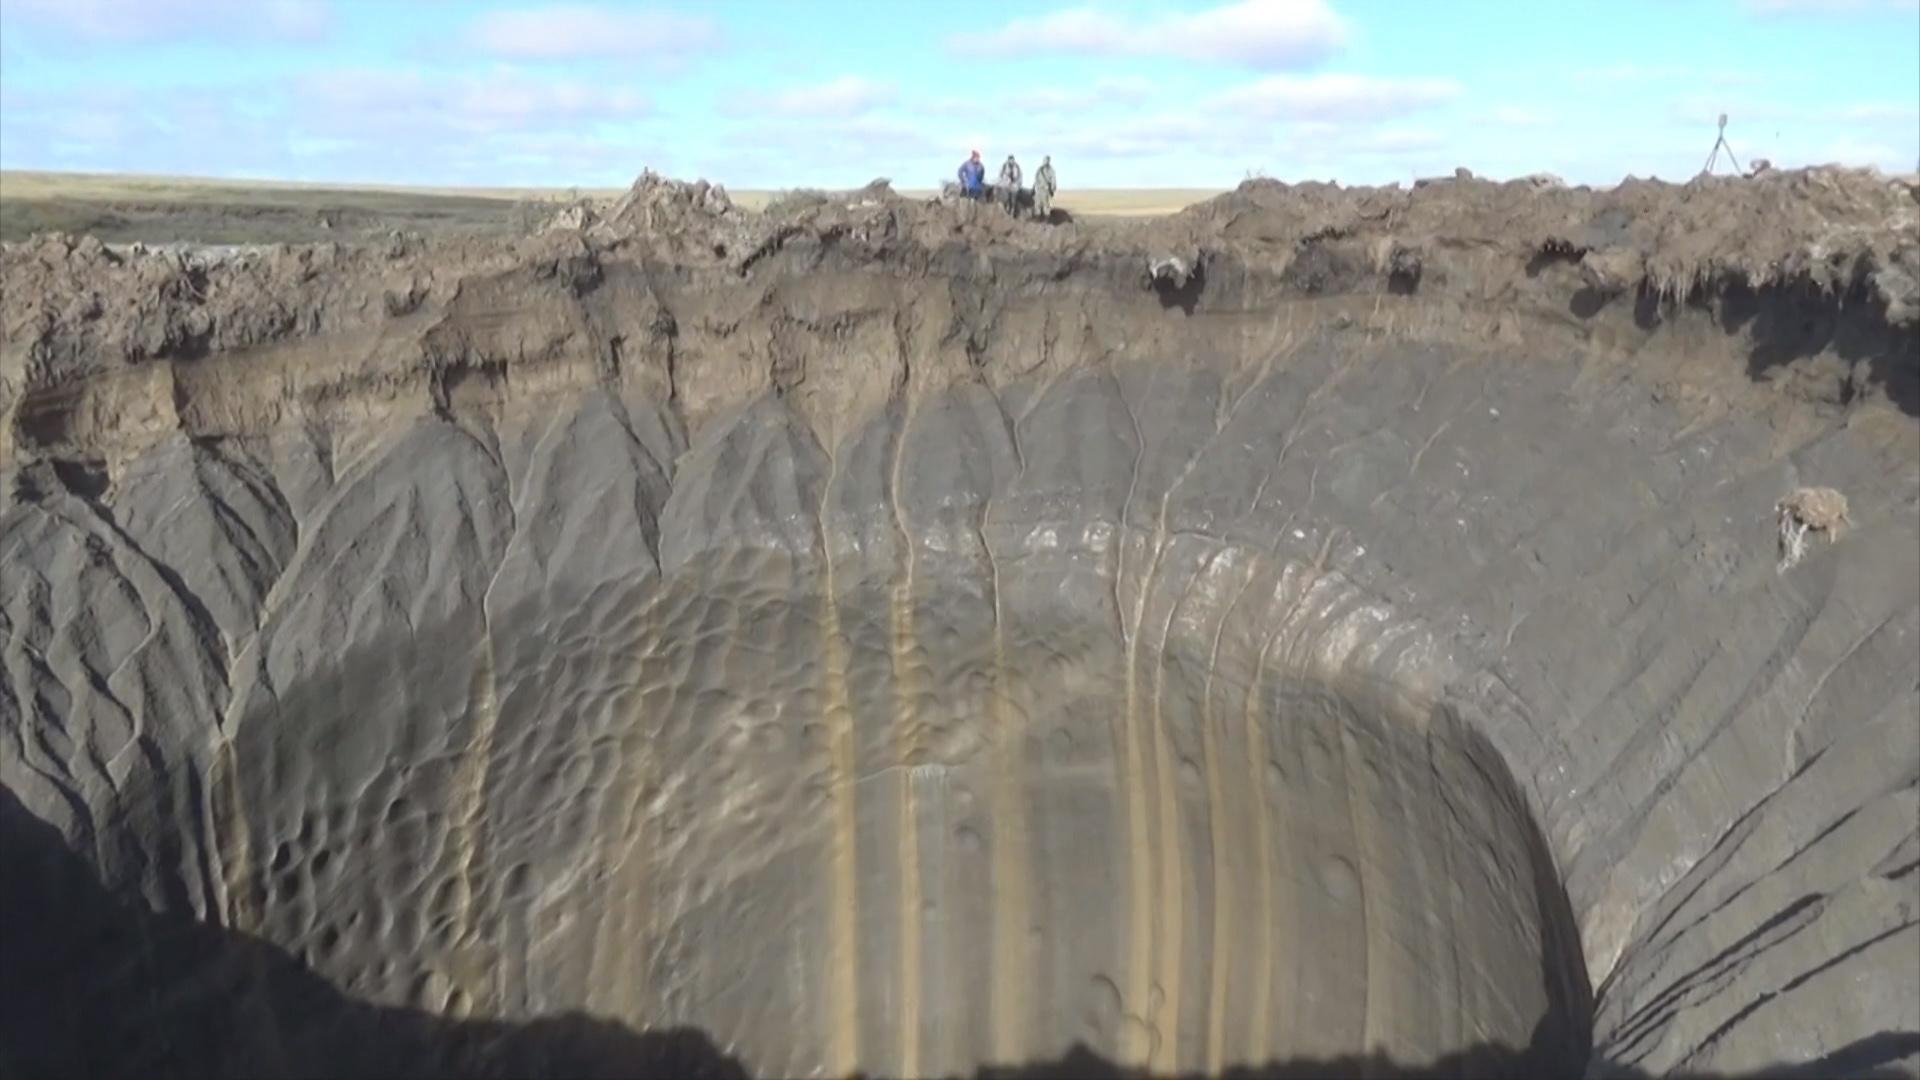 Siberian Sinkholes: Scientists Probing Mystery Run Low on Cash